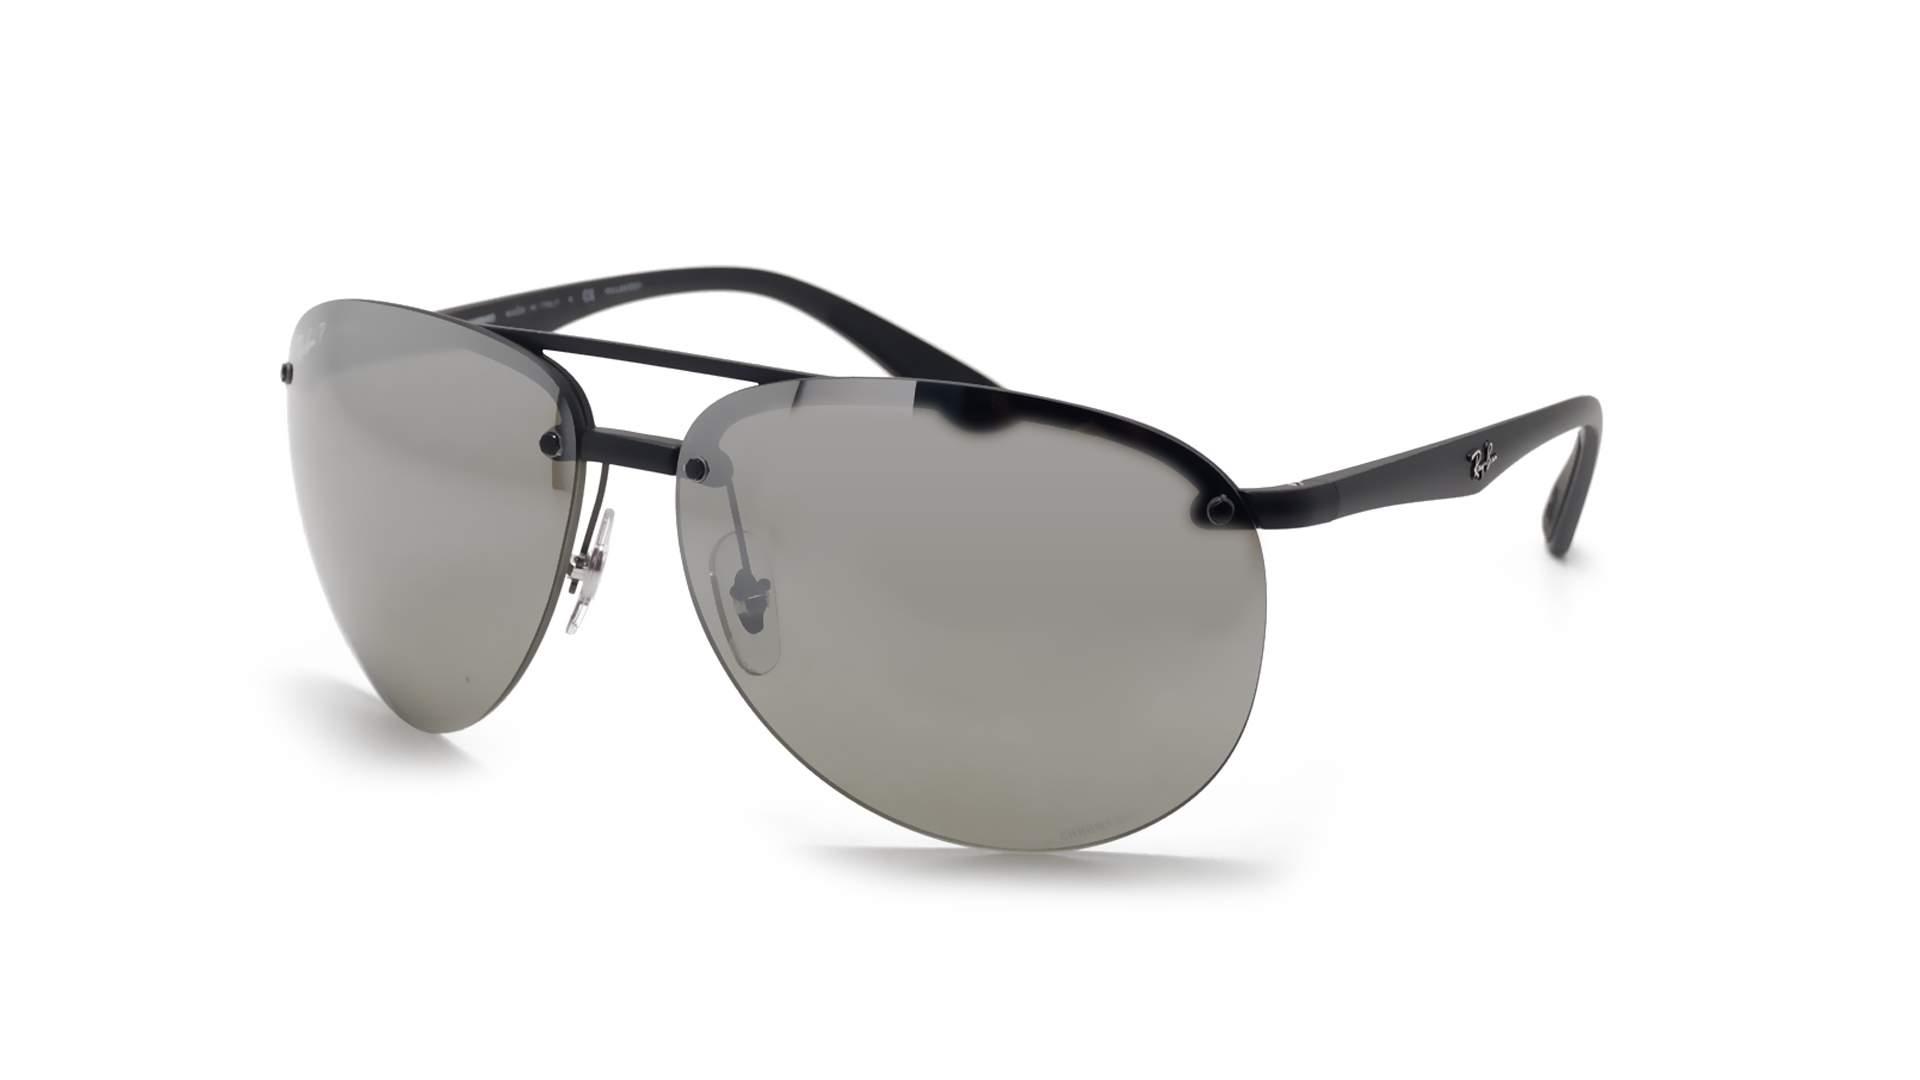 2eb84e4800 Sunglasses Ray-Ban RB4293CH 601S 5J 65-13 Black Matte Chromance Large  Polarized Mirror